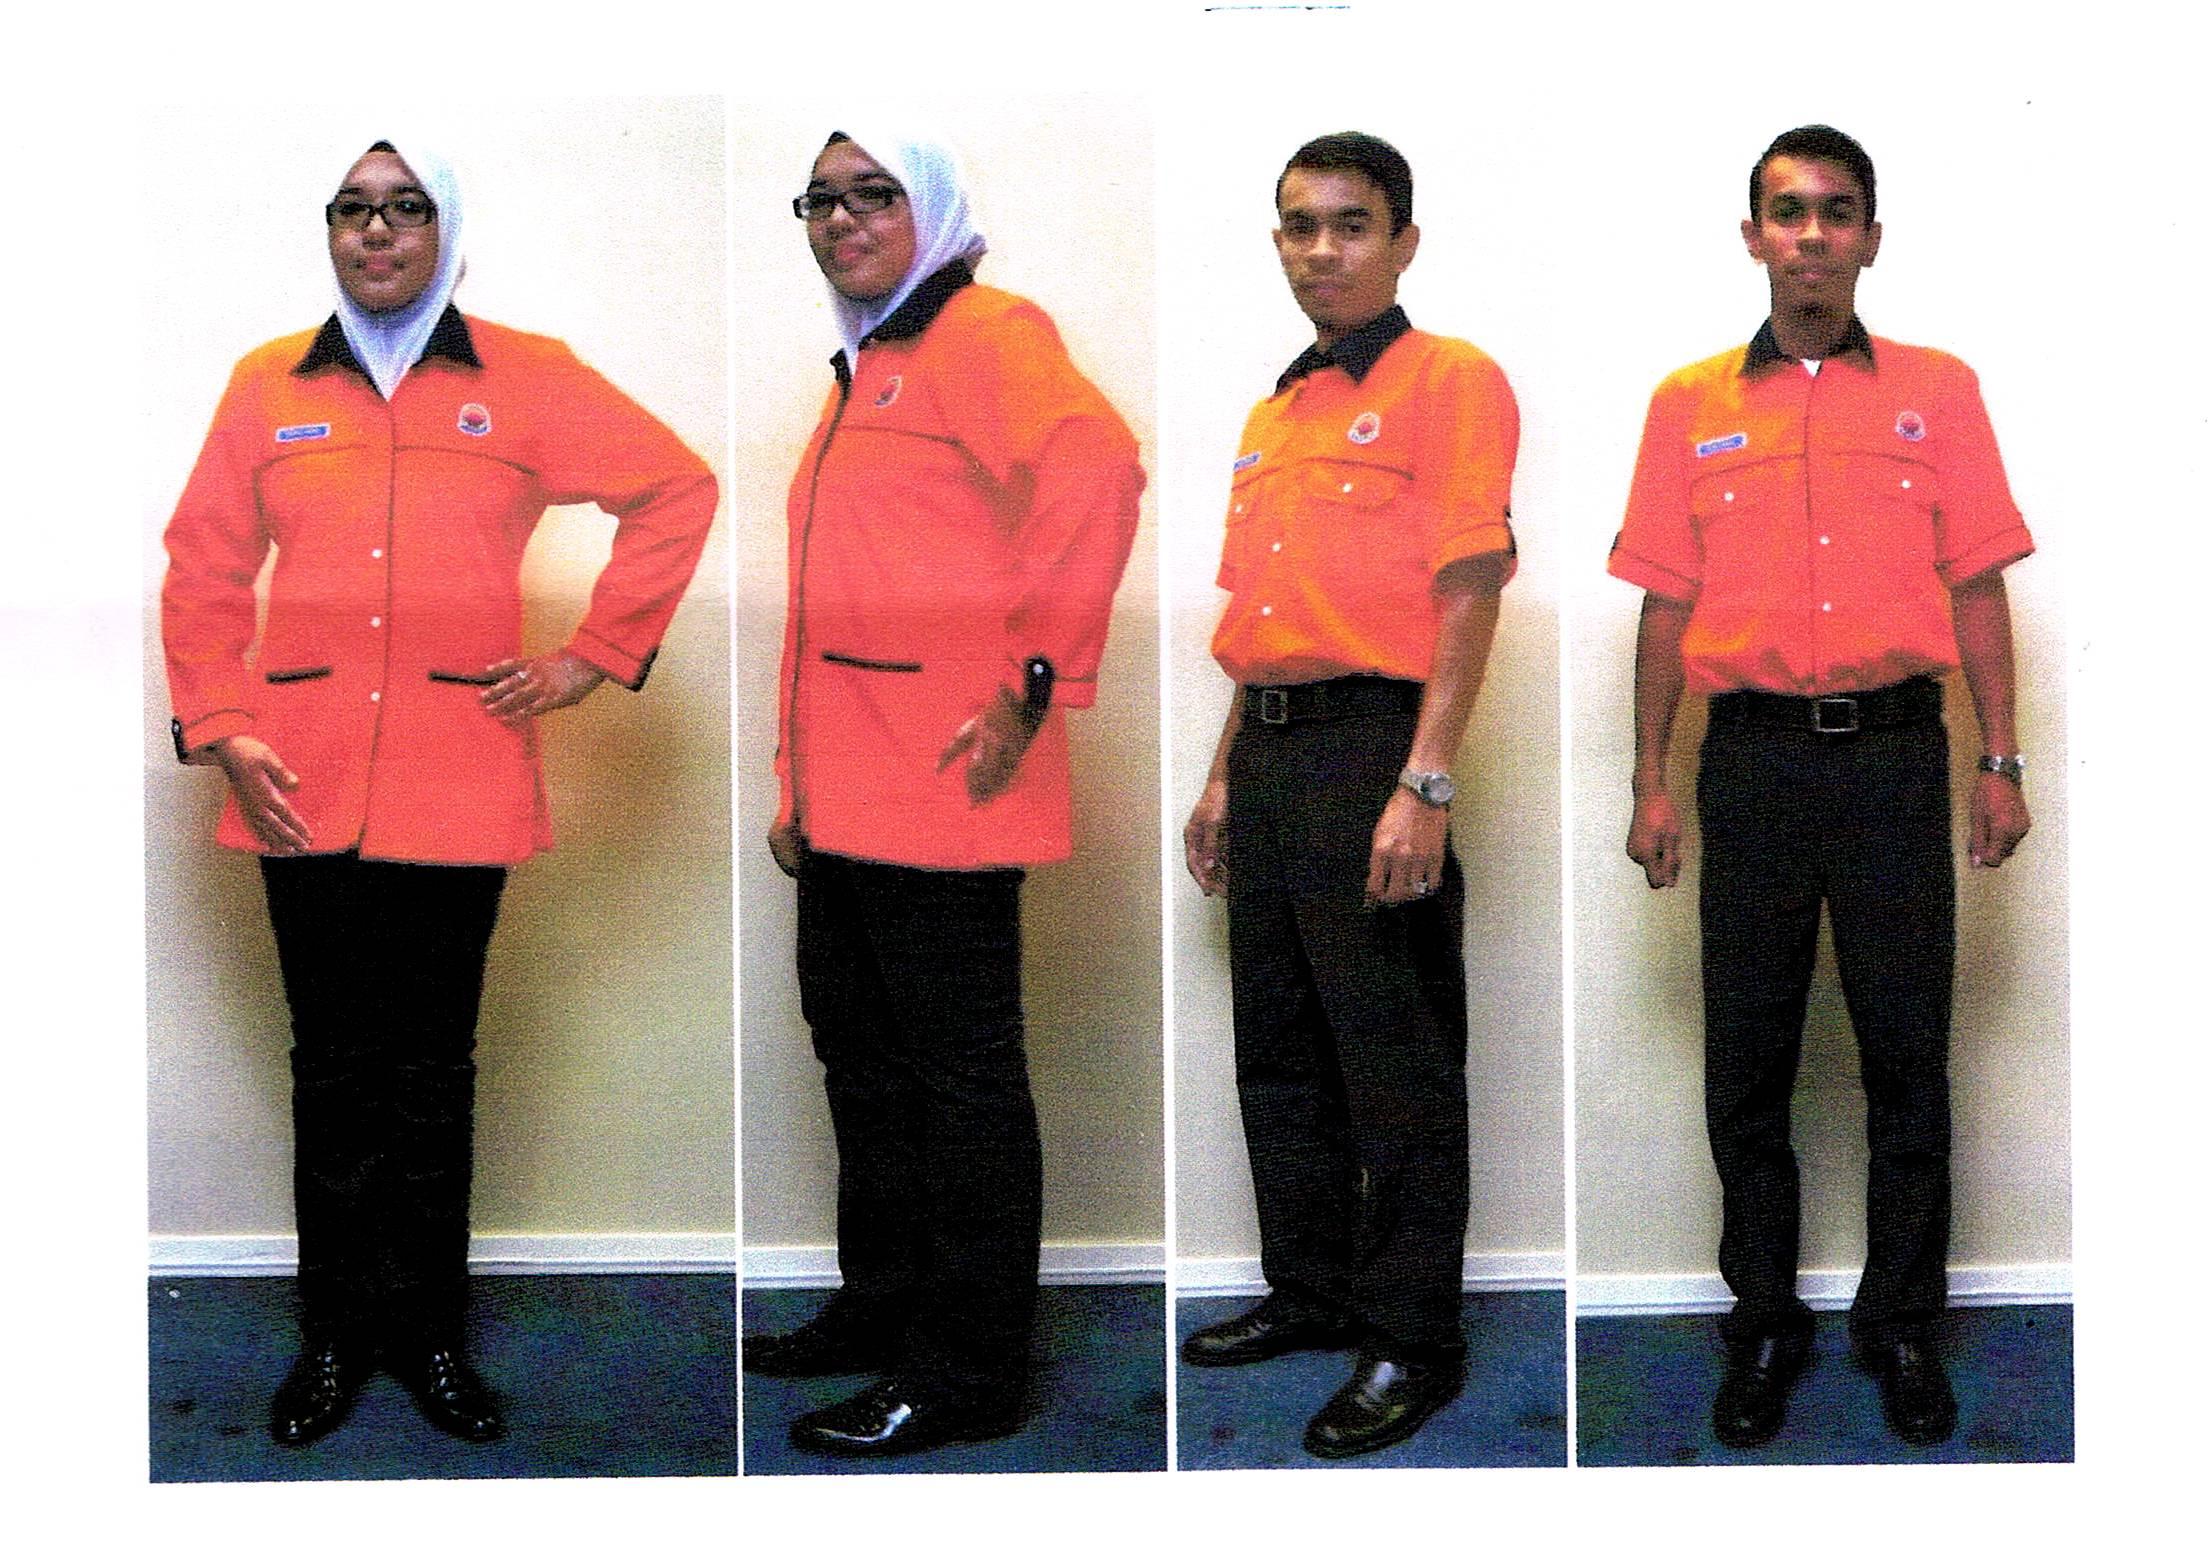 Uniform Sekolah Menengah Teknik Kronis L